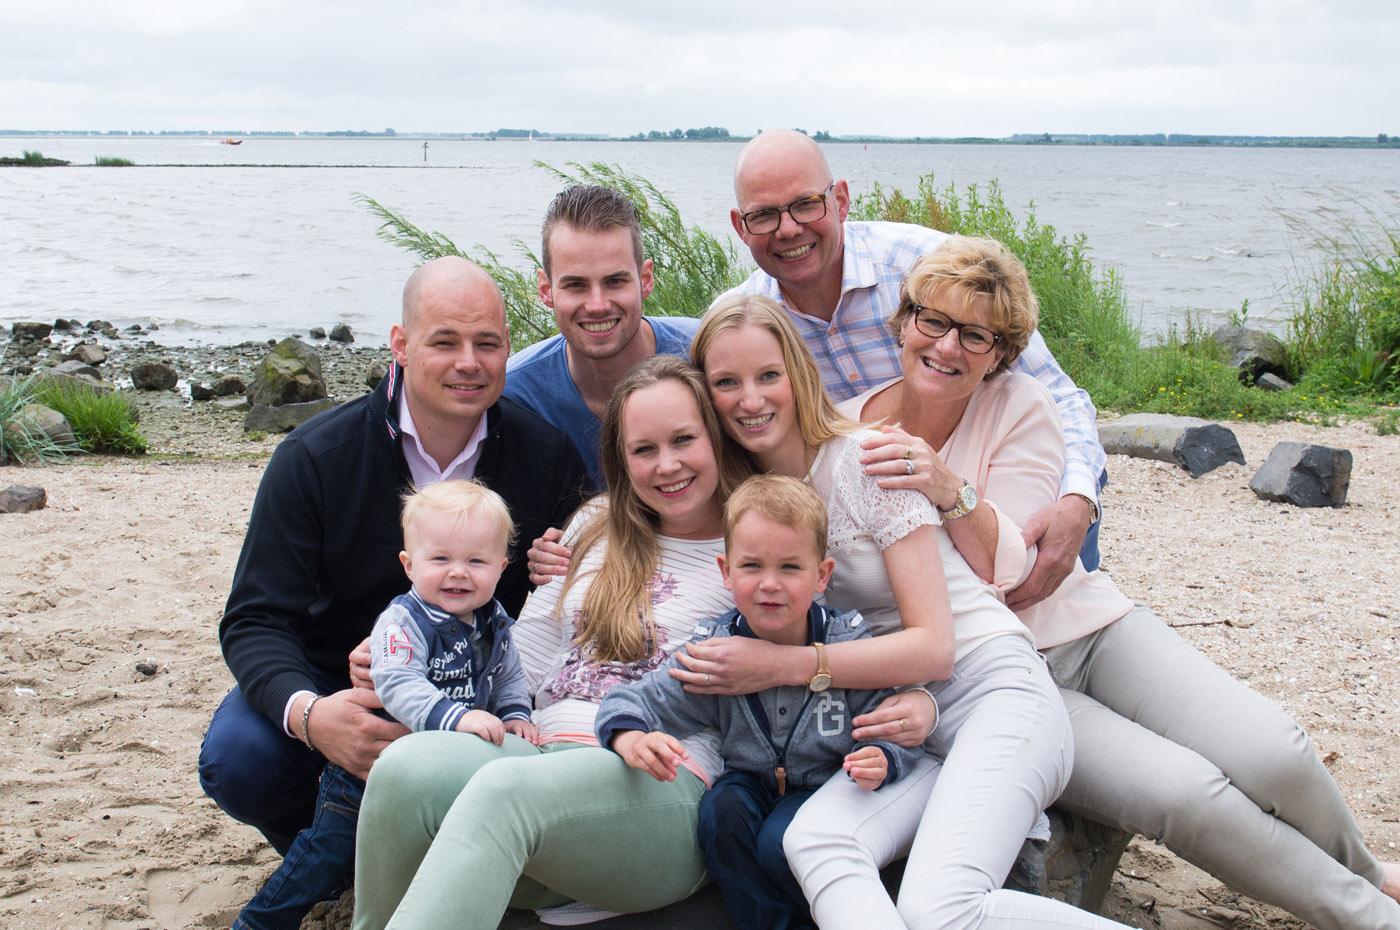 groepsfotografie, familiereportage Hellevoetsluis